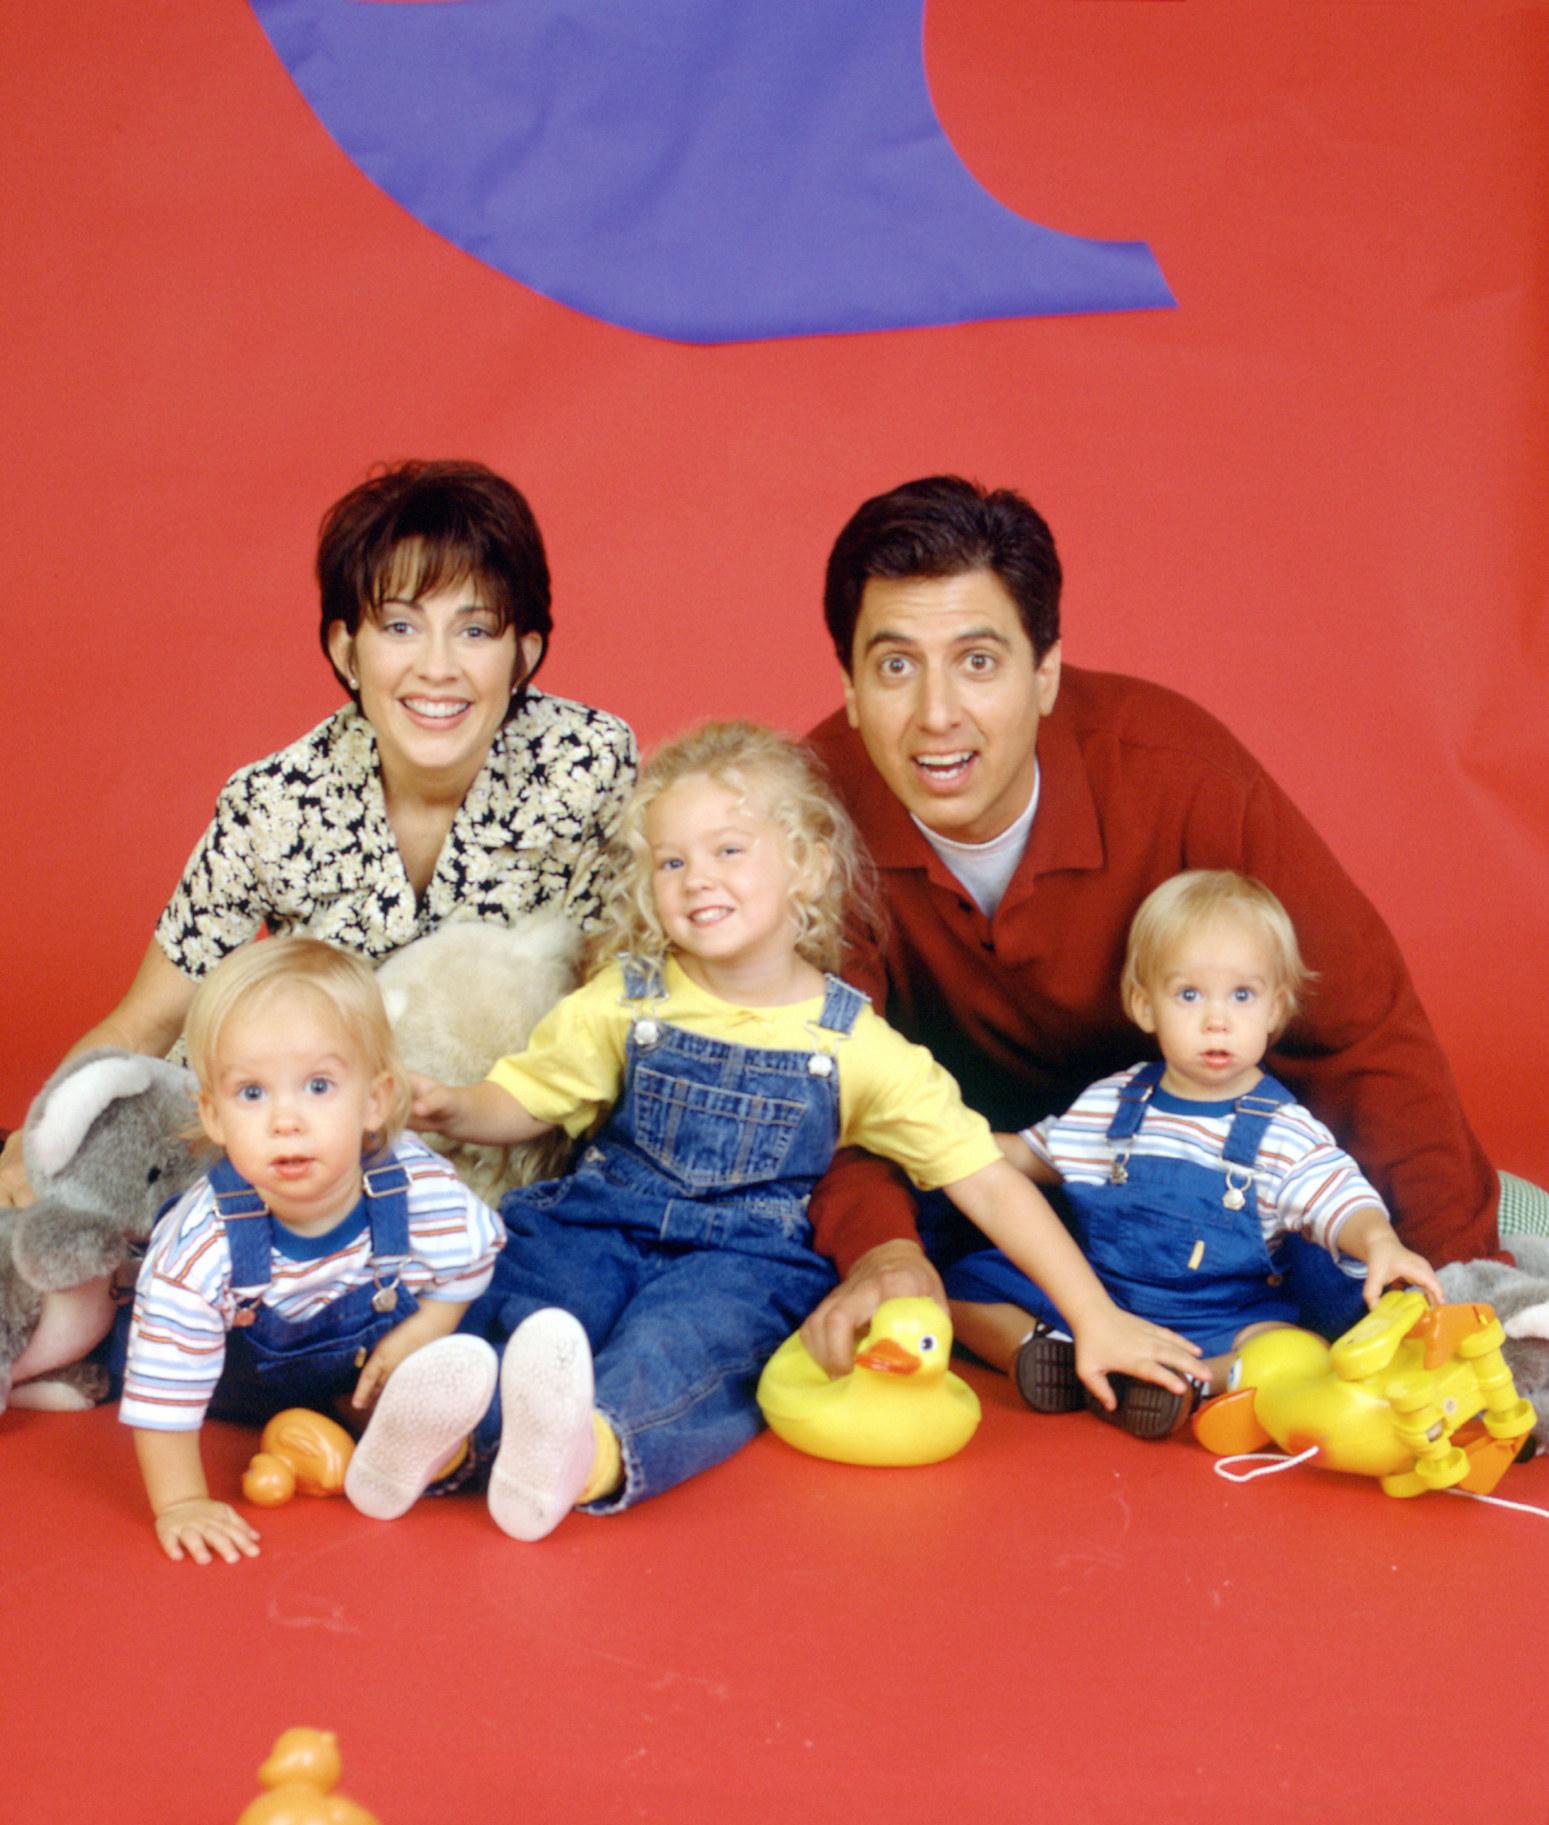 the Barone family